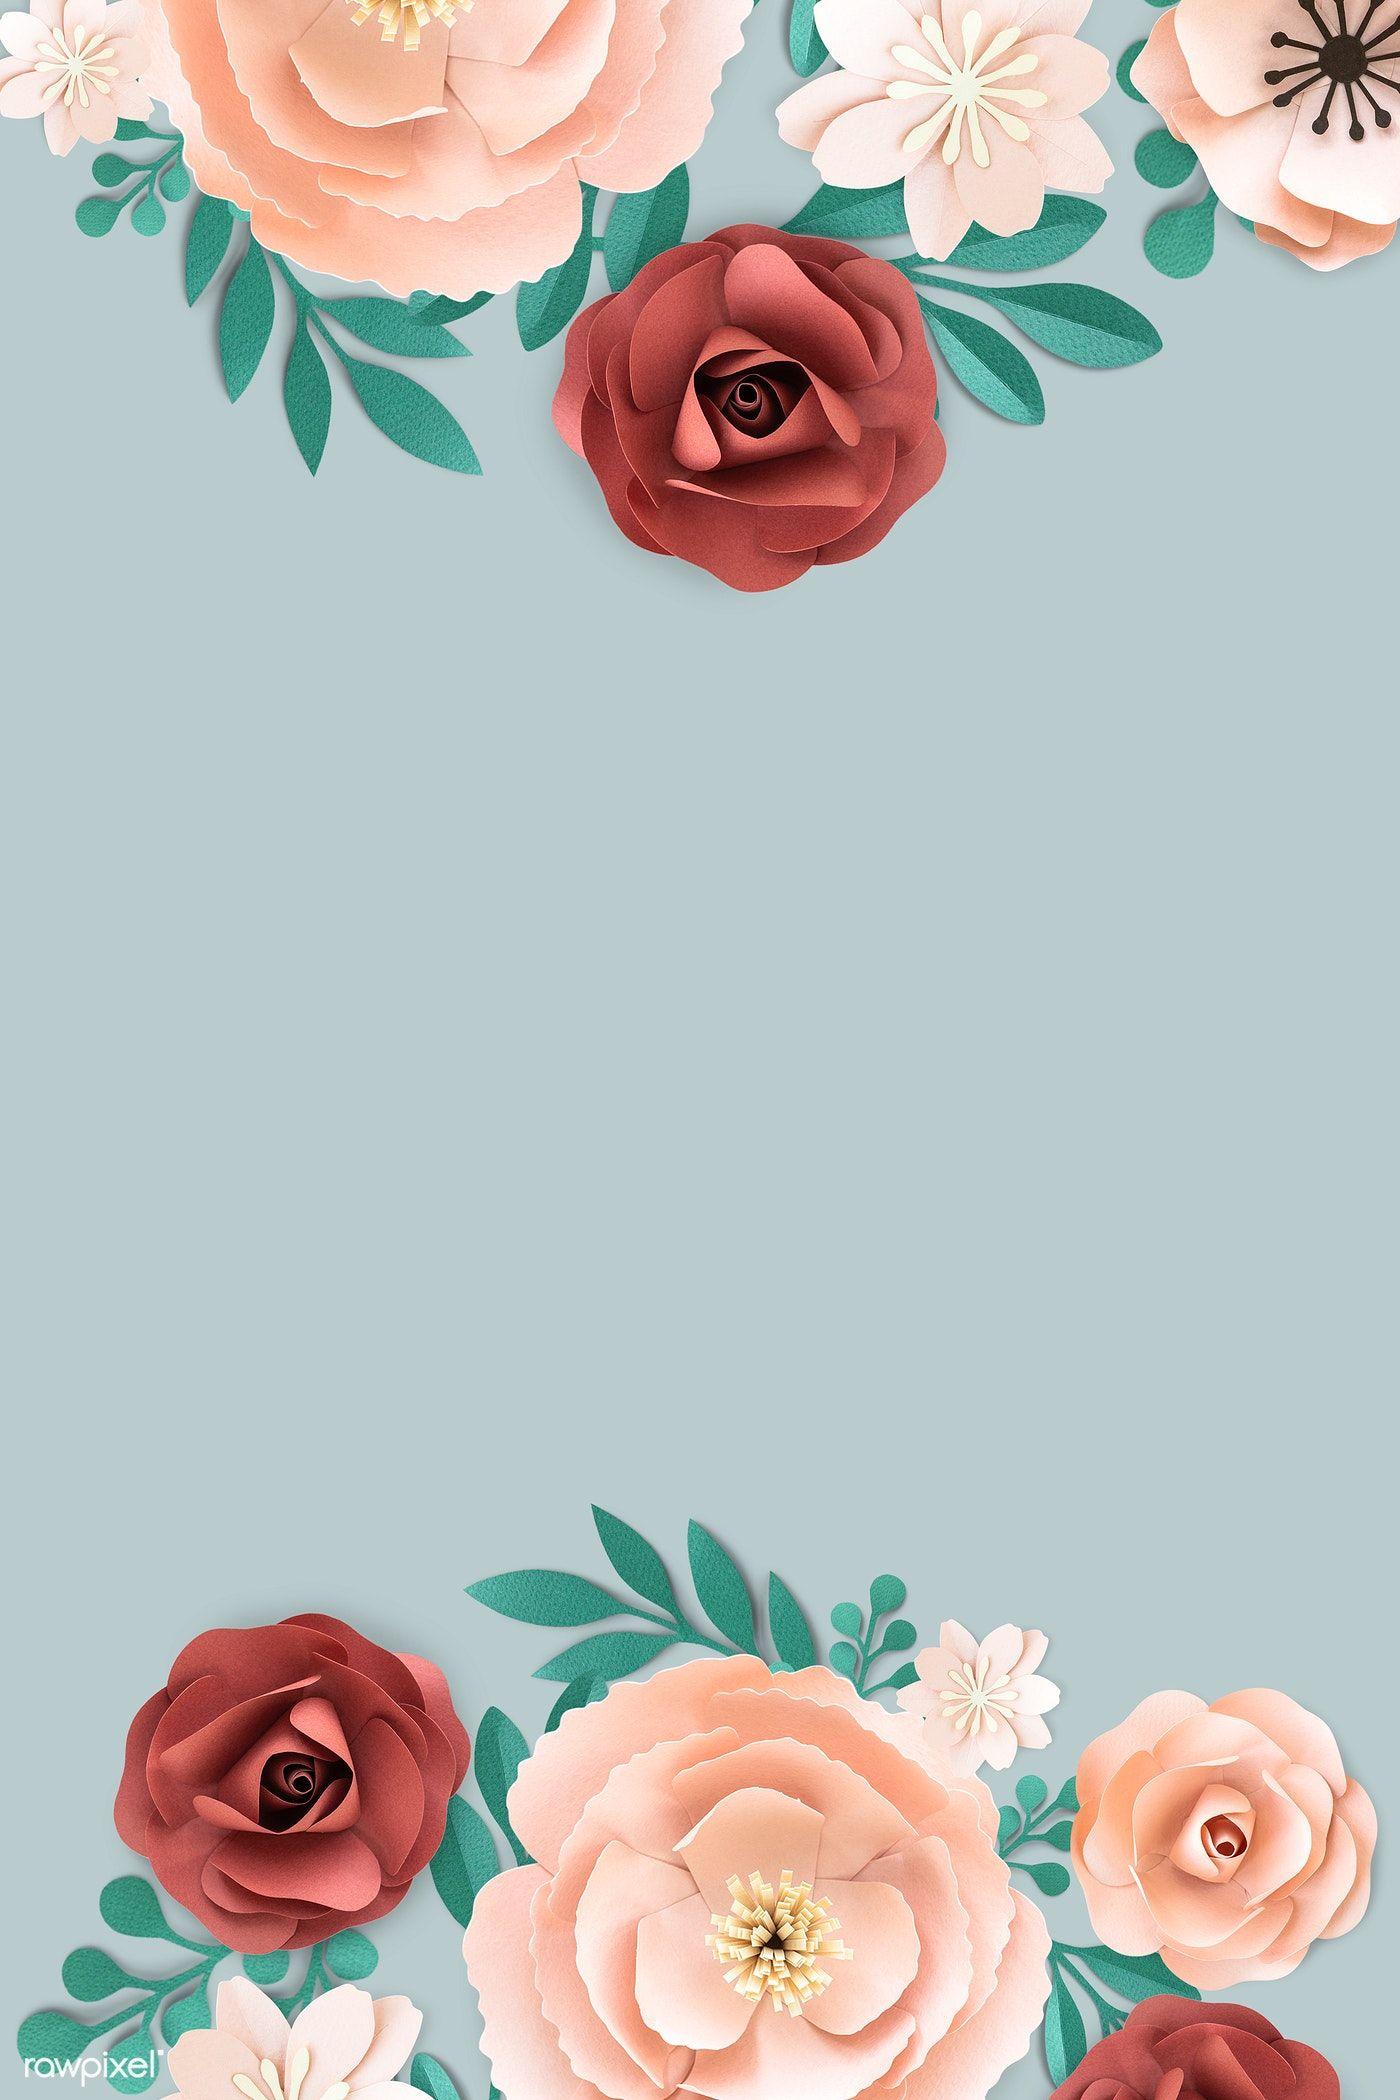 Download premium psd of Blooming floral frame design